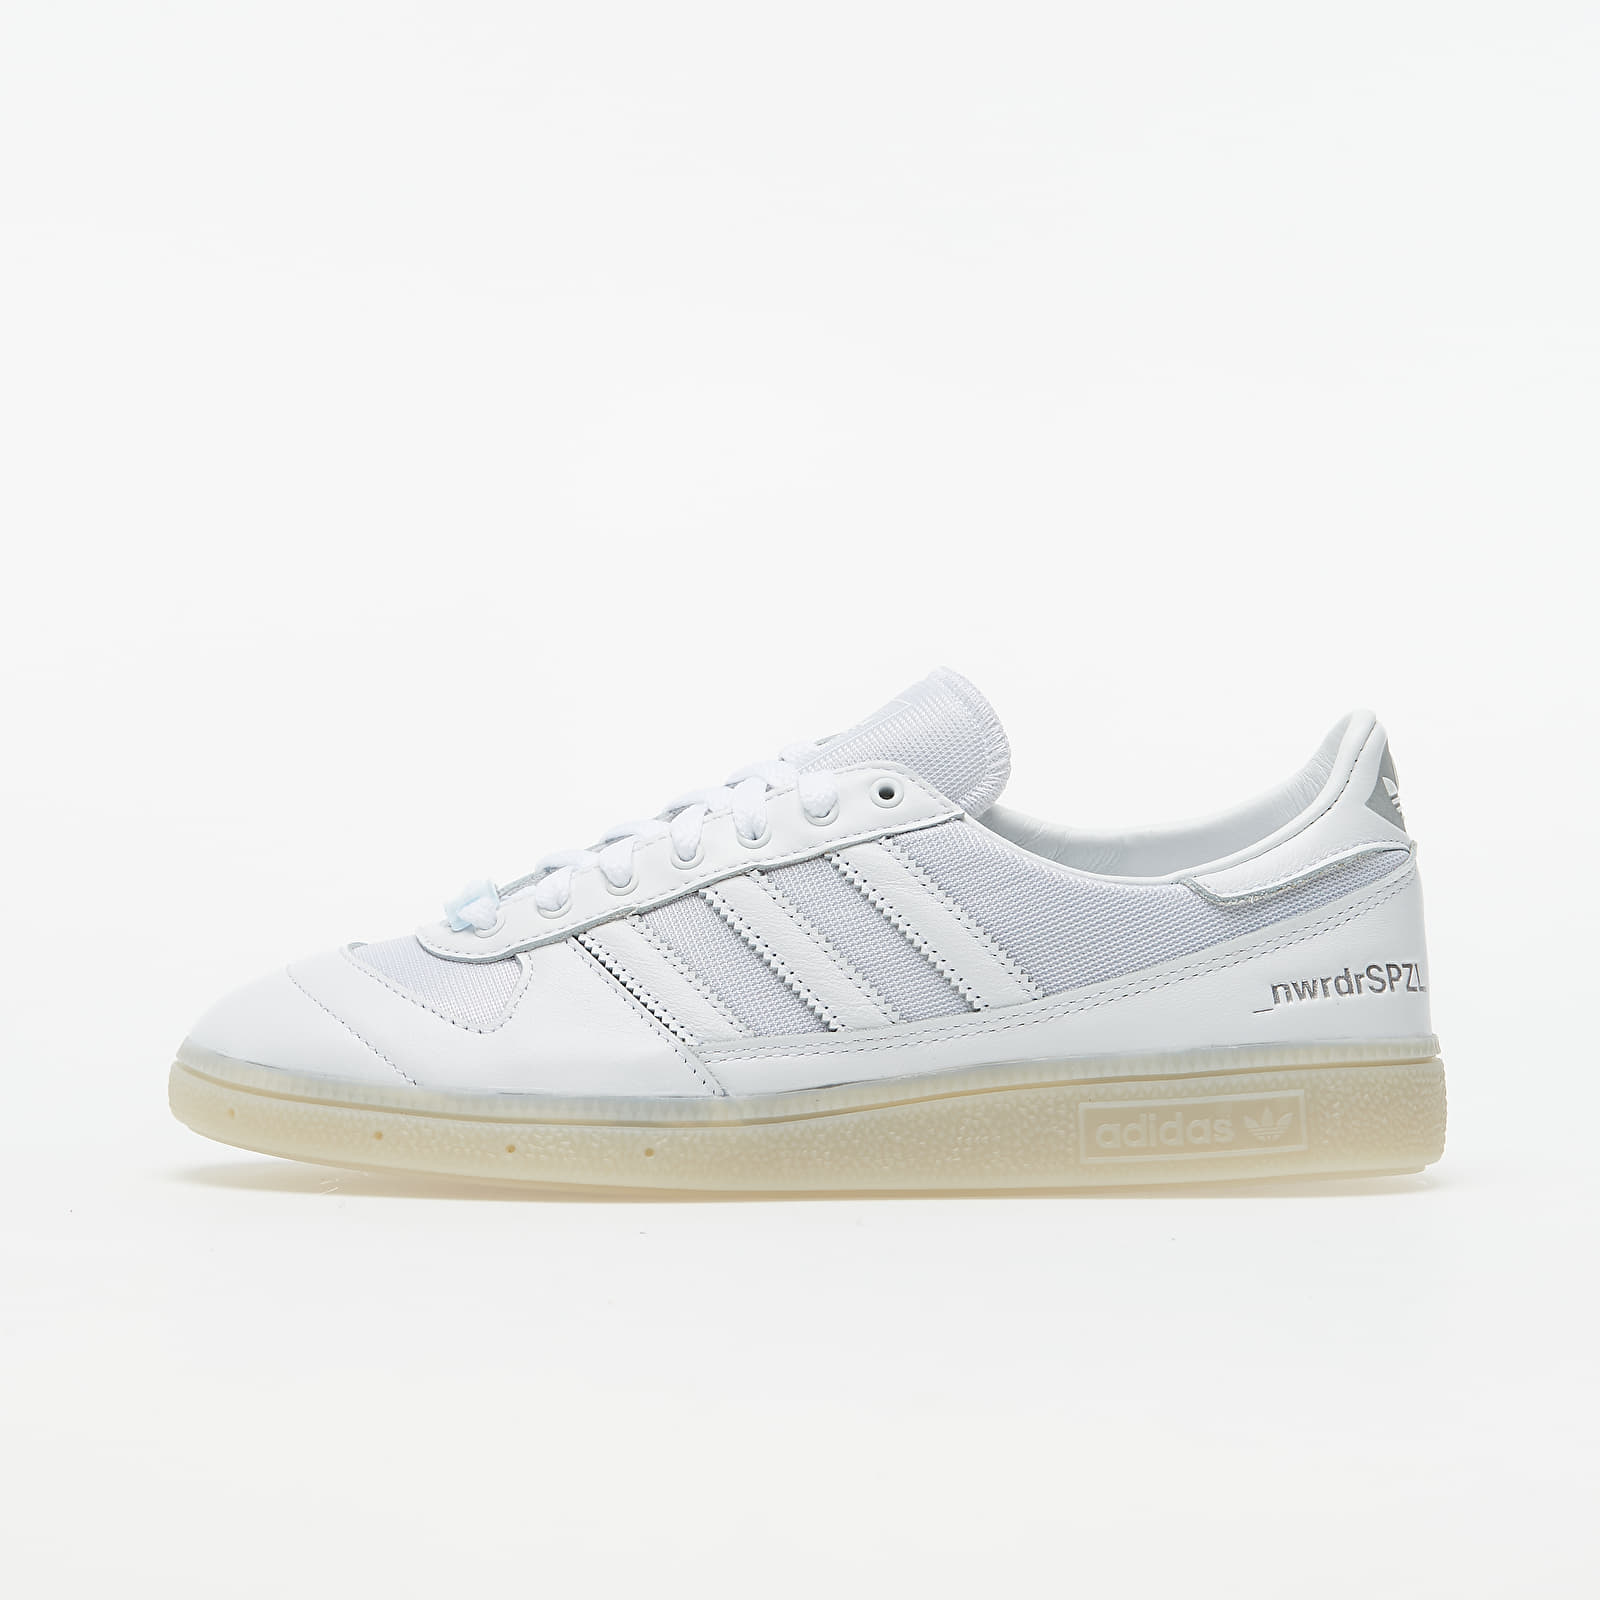 adidas WILSY SPZL Ftwr White/ Ftwr White/ Grey Three FX1056